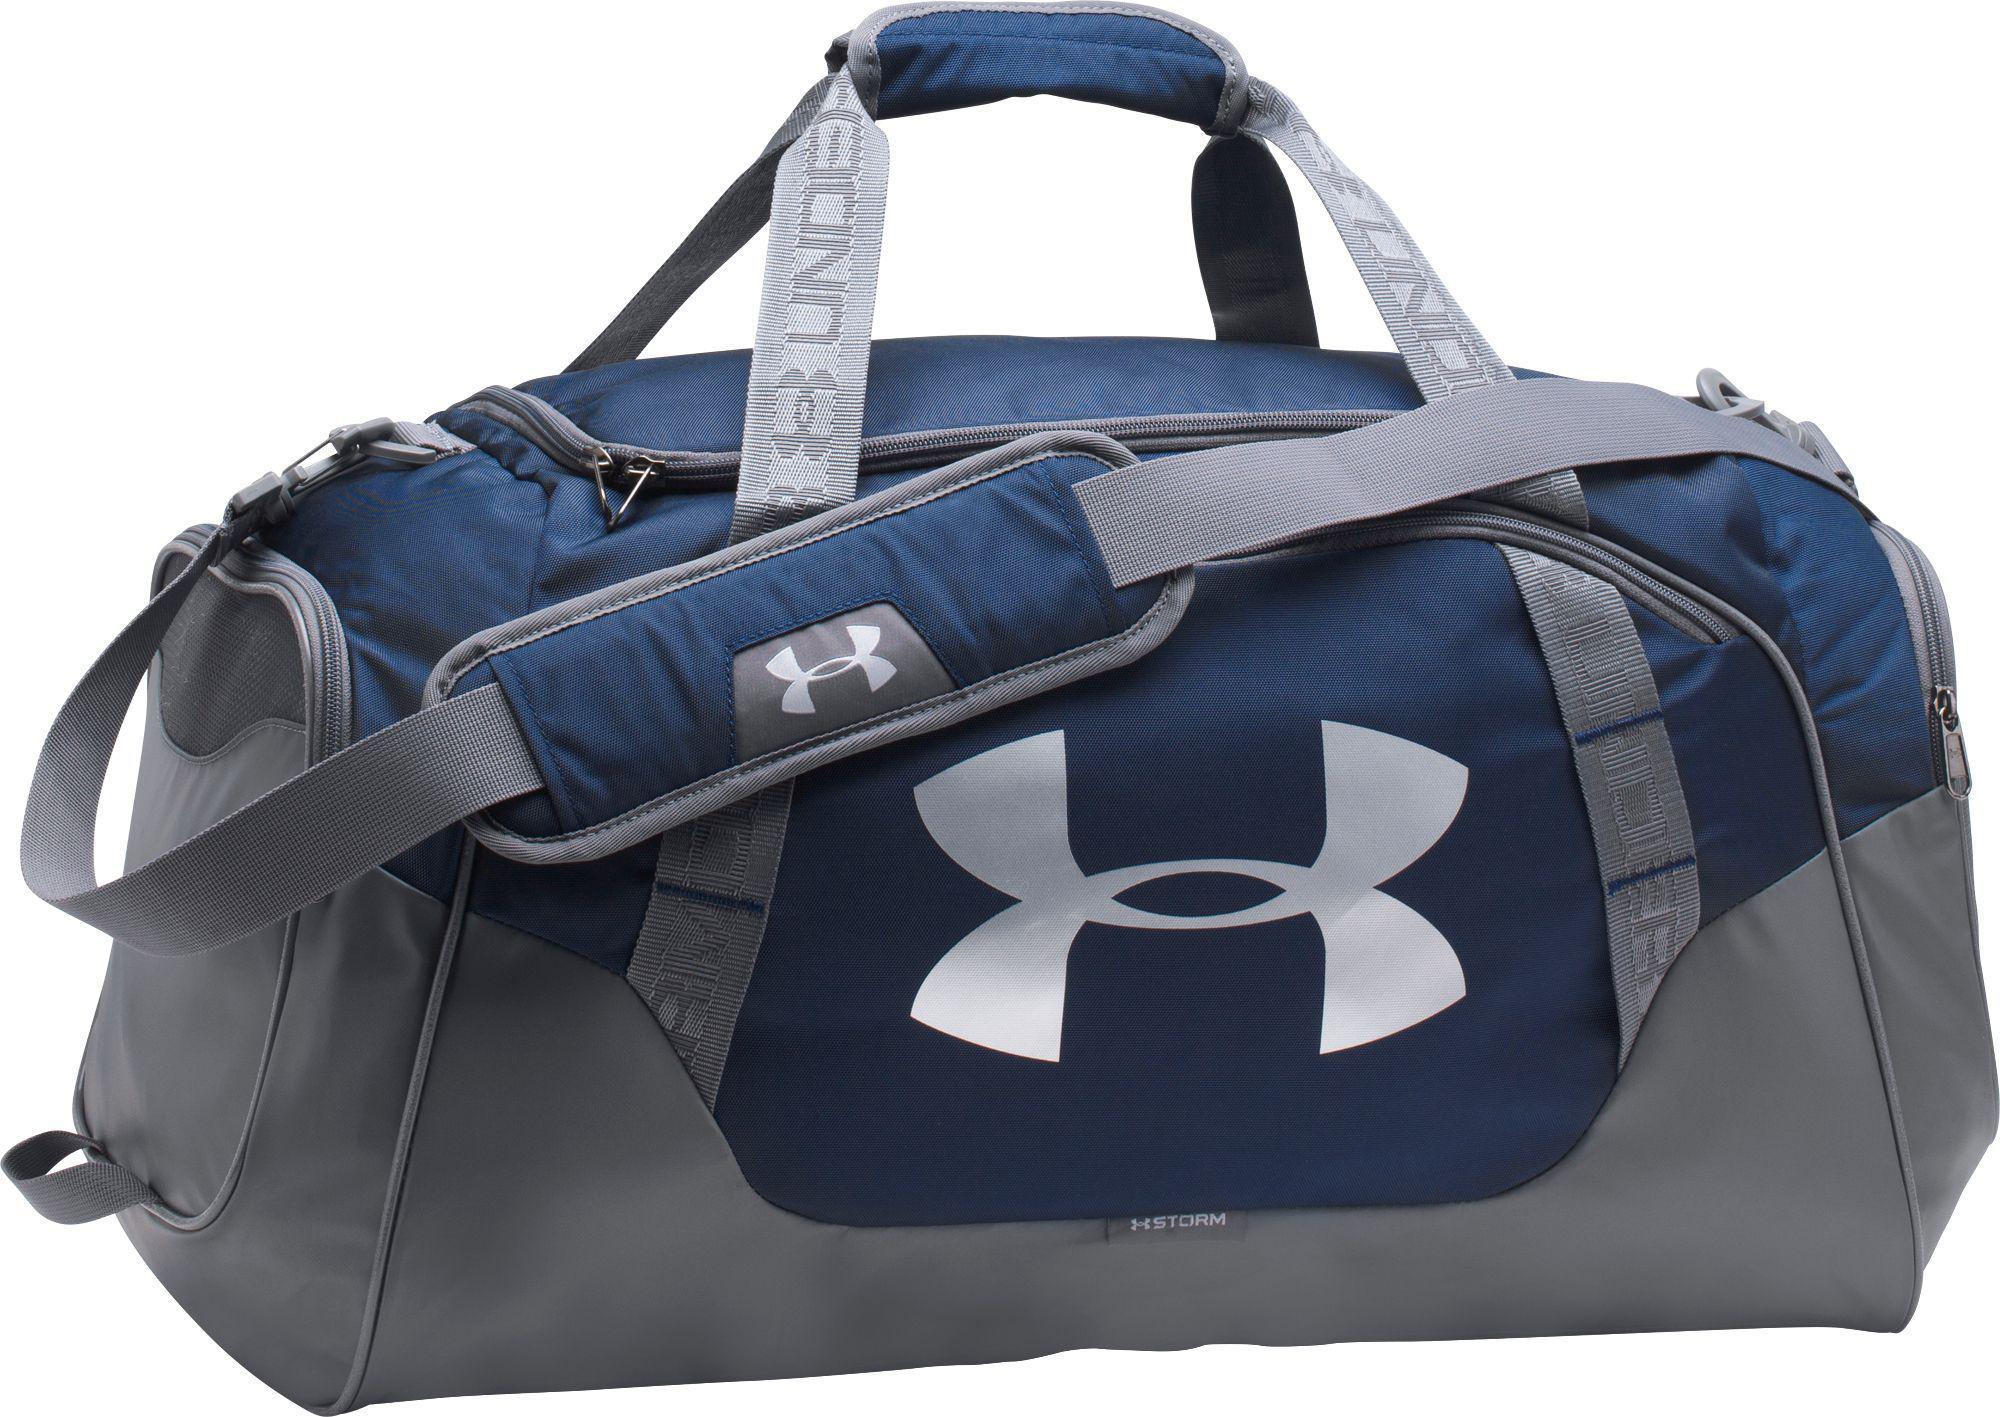 b4f91ffd39 Lyst - Under Armour Undeniable 3.0 Medium Duffle Bag in Blue for Men ...